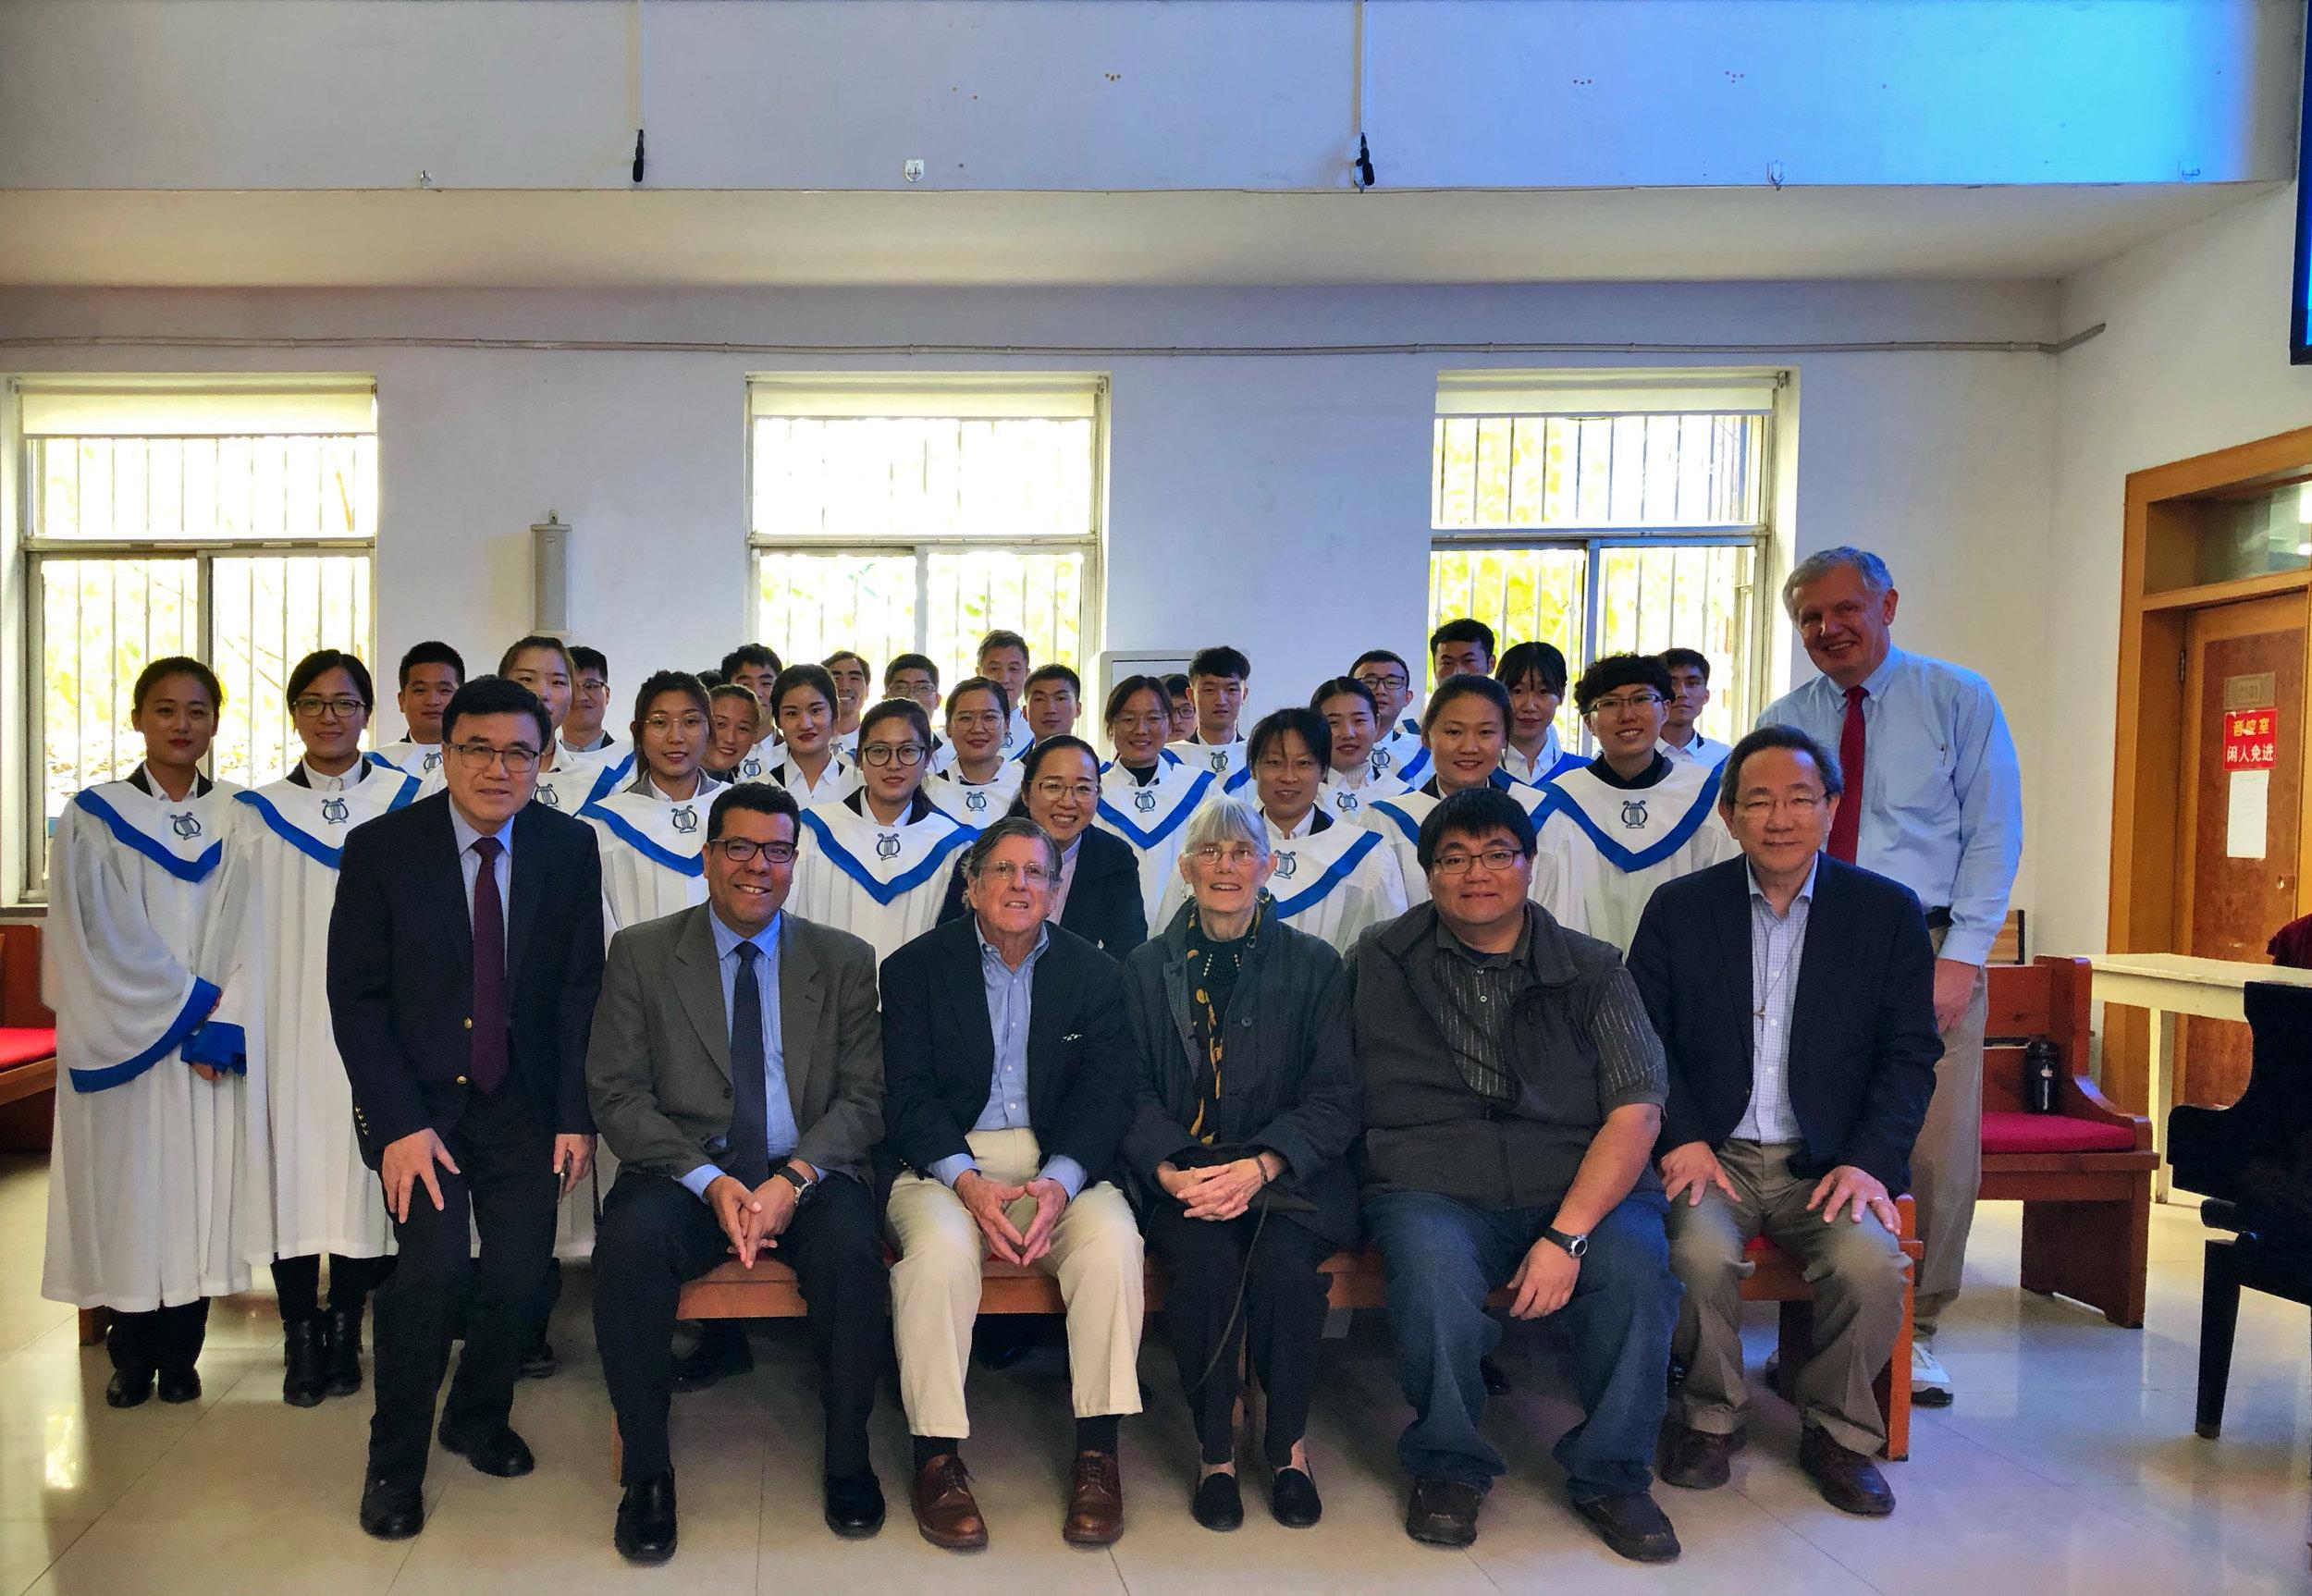 With the choir at Jinan International Church